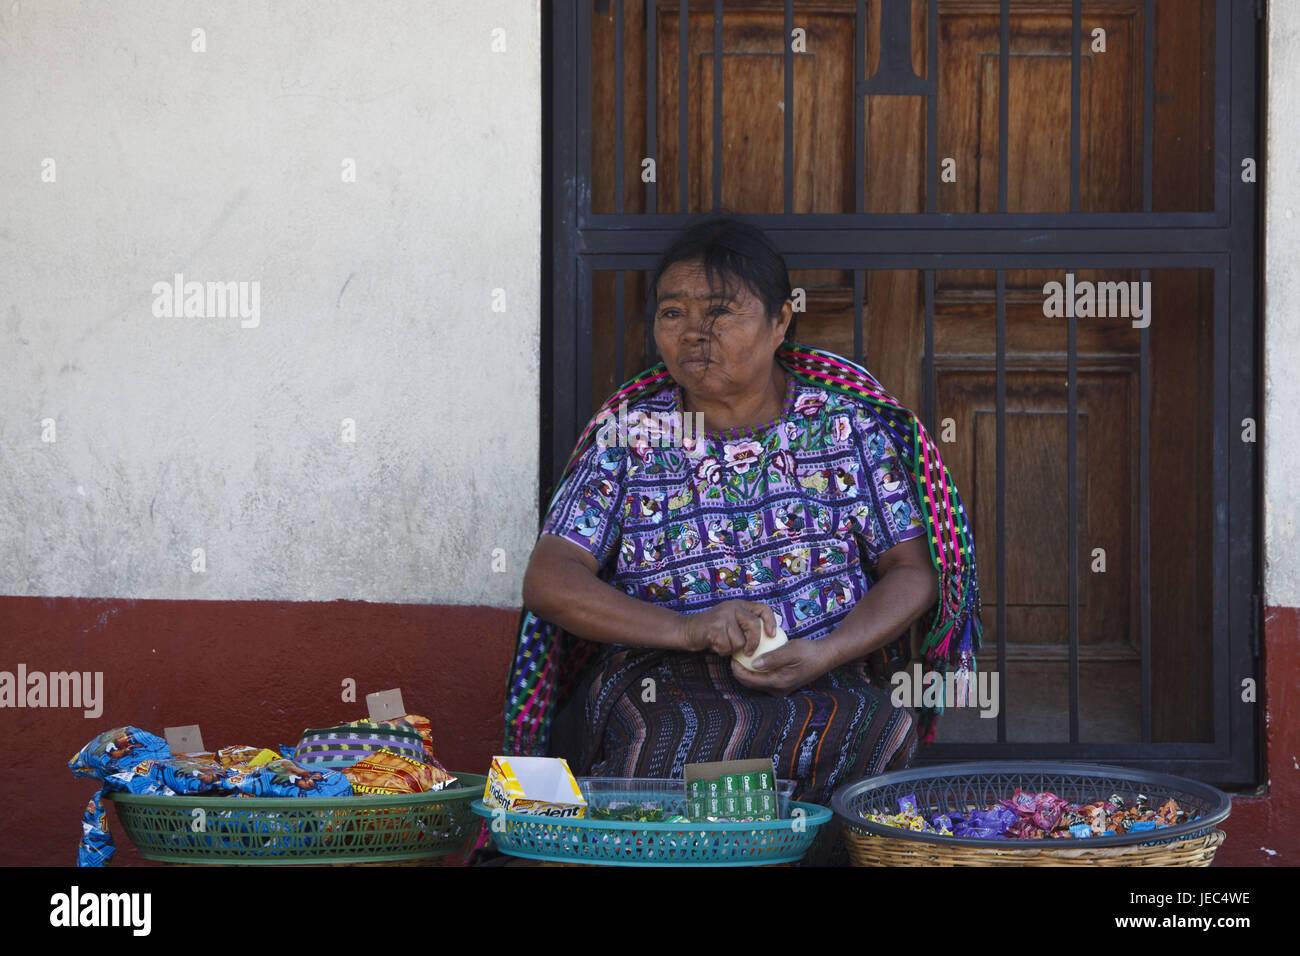 Guatemala, Atitlan lake, woman, Maya, selling, no model release, - Stock Image